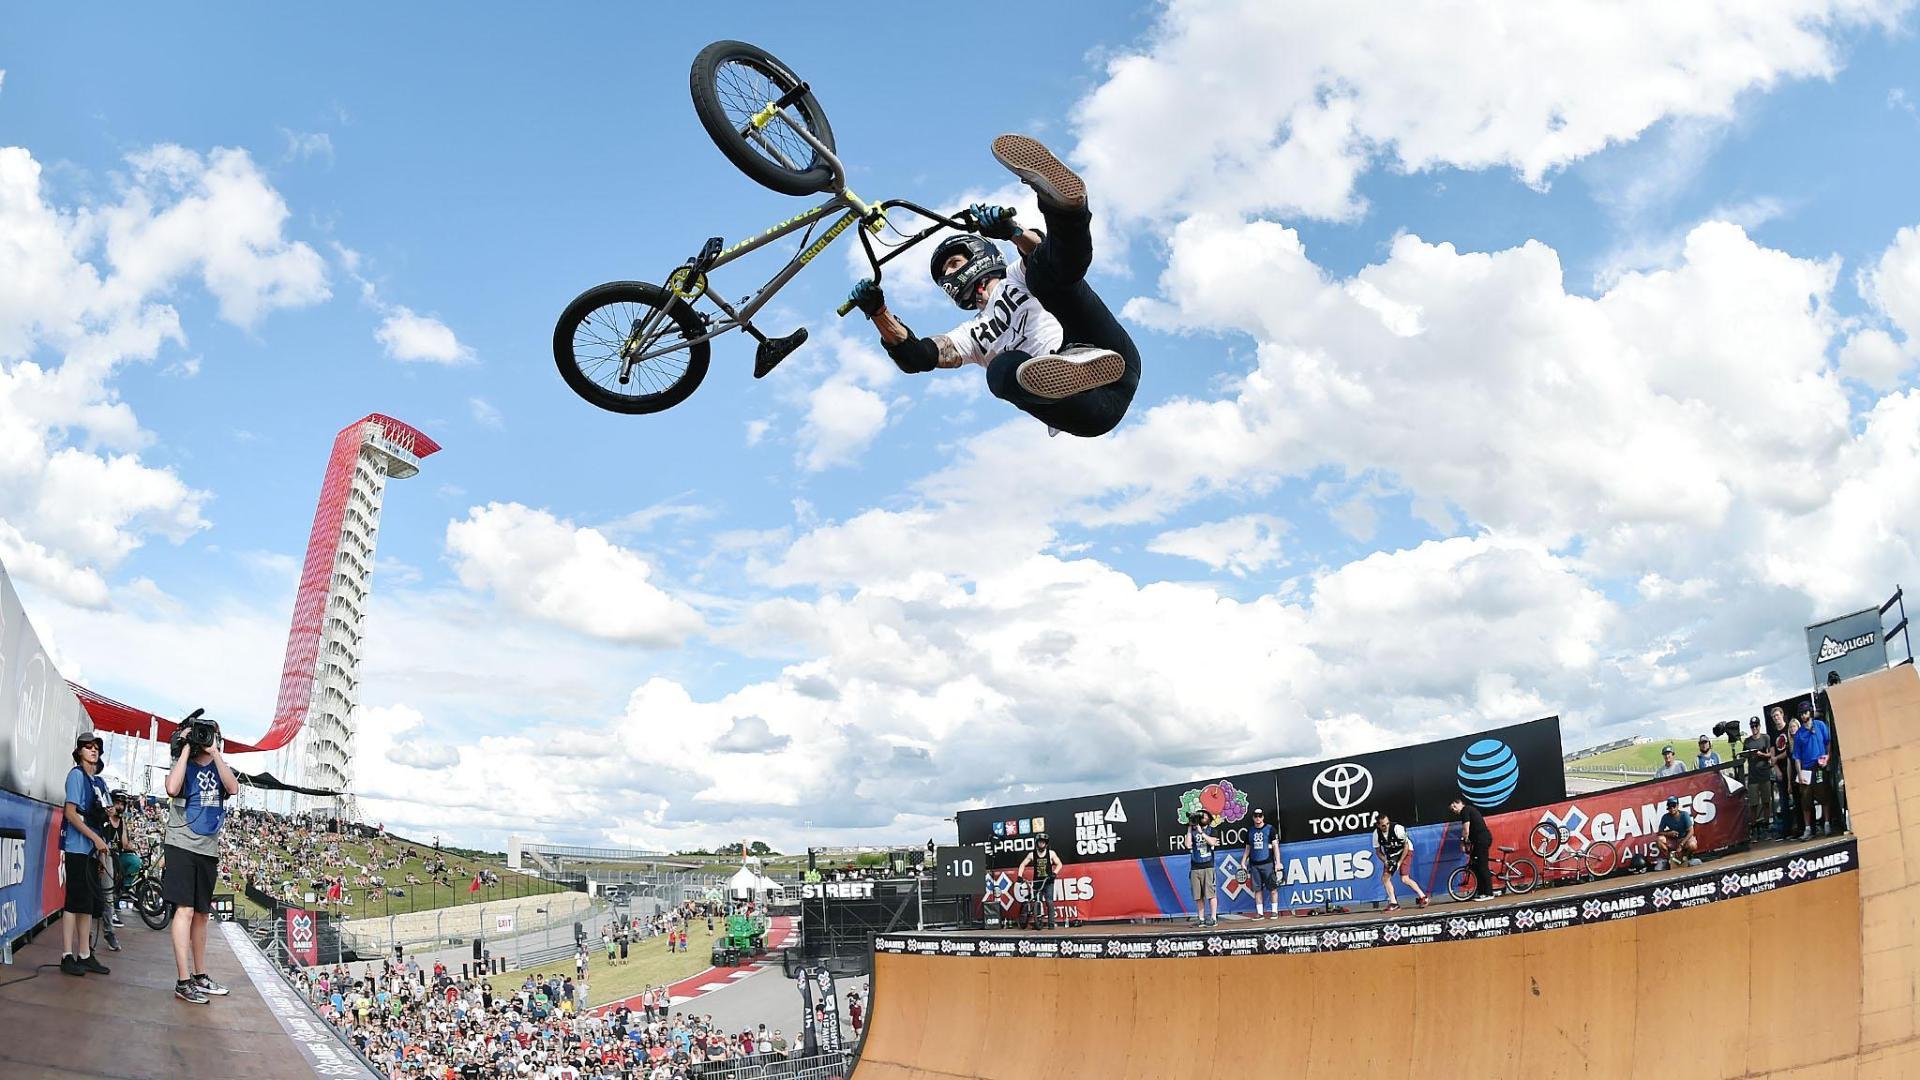 Jamie Bestwick wins X Games BMX Vert gold